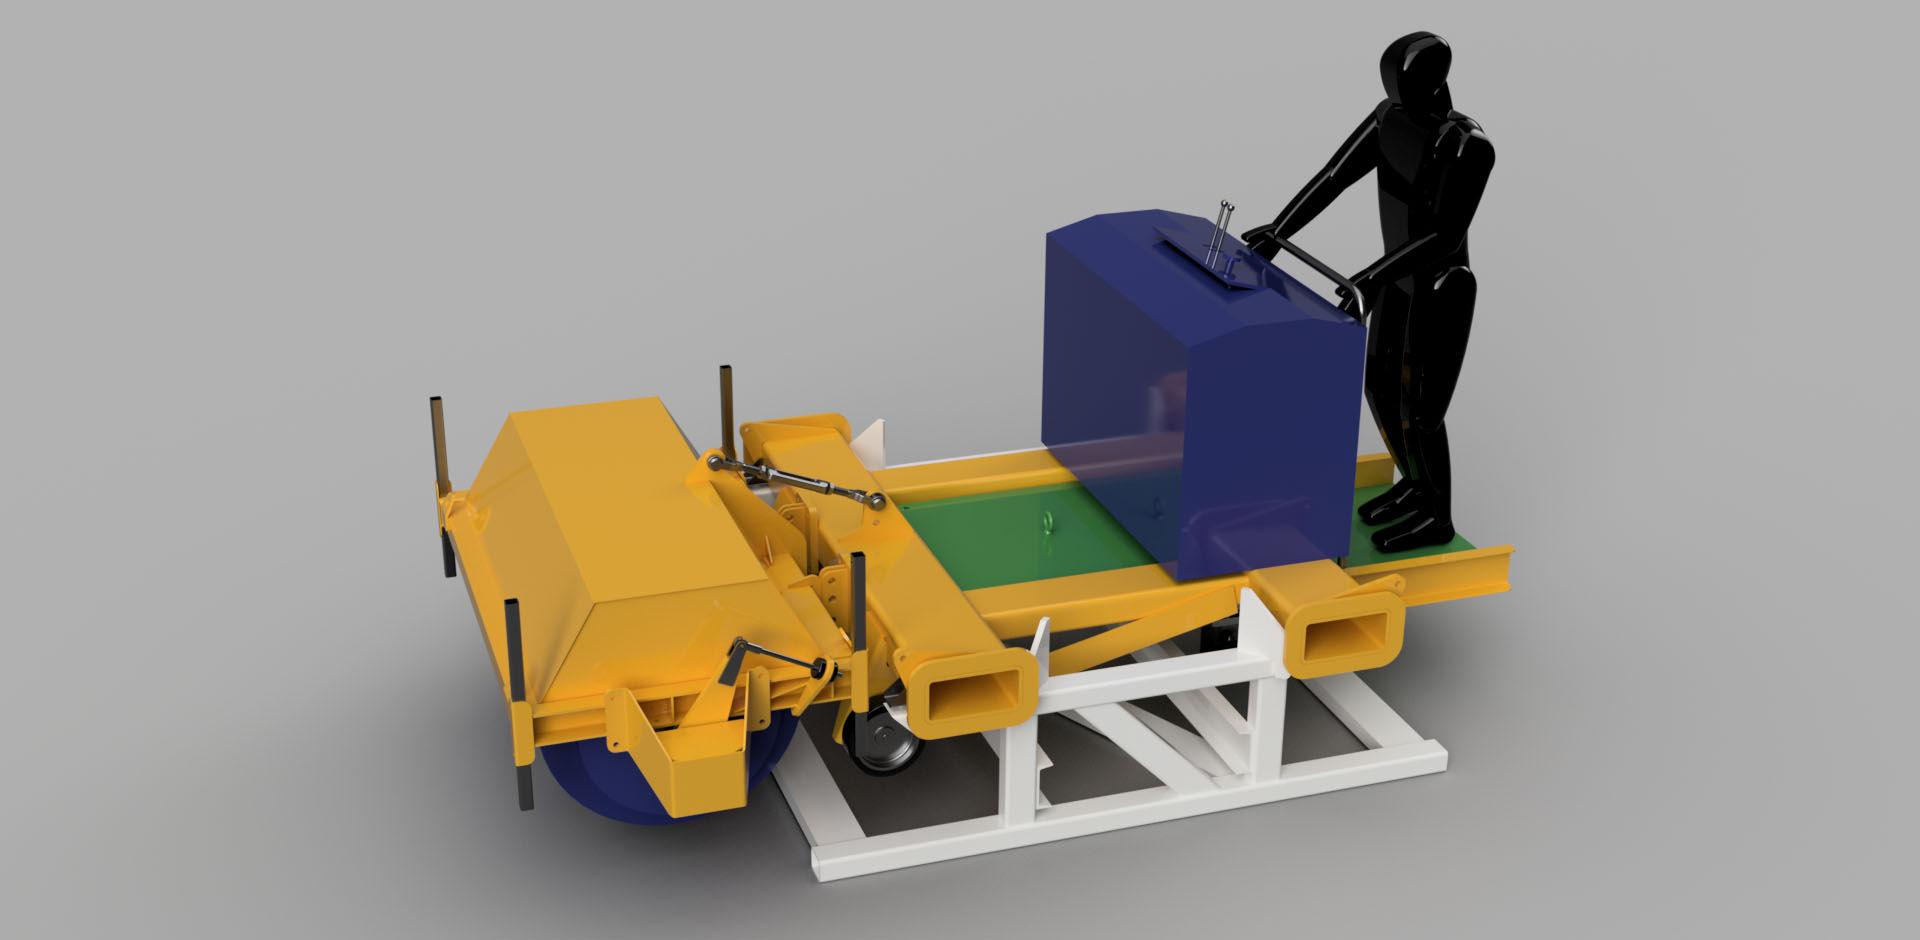 Sweeper-1-3500-3500